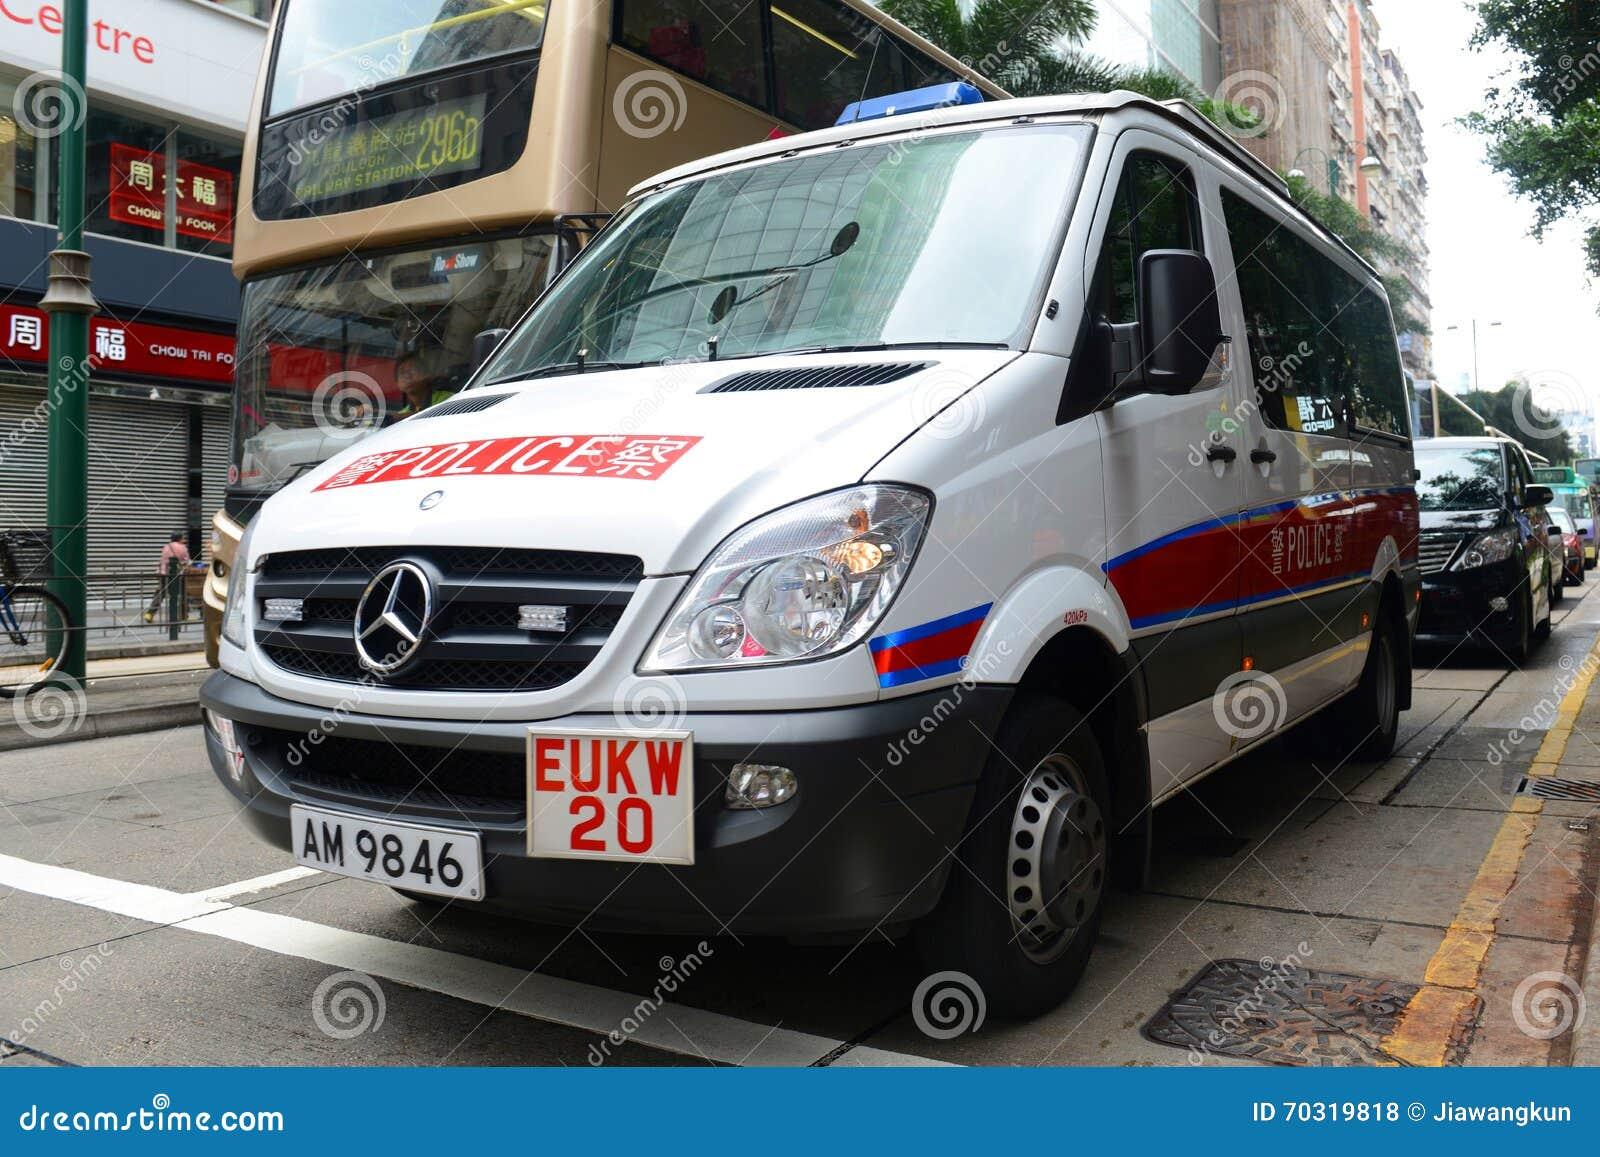 Hong Kong police vehicle on duty